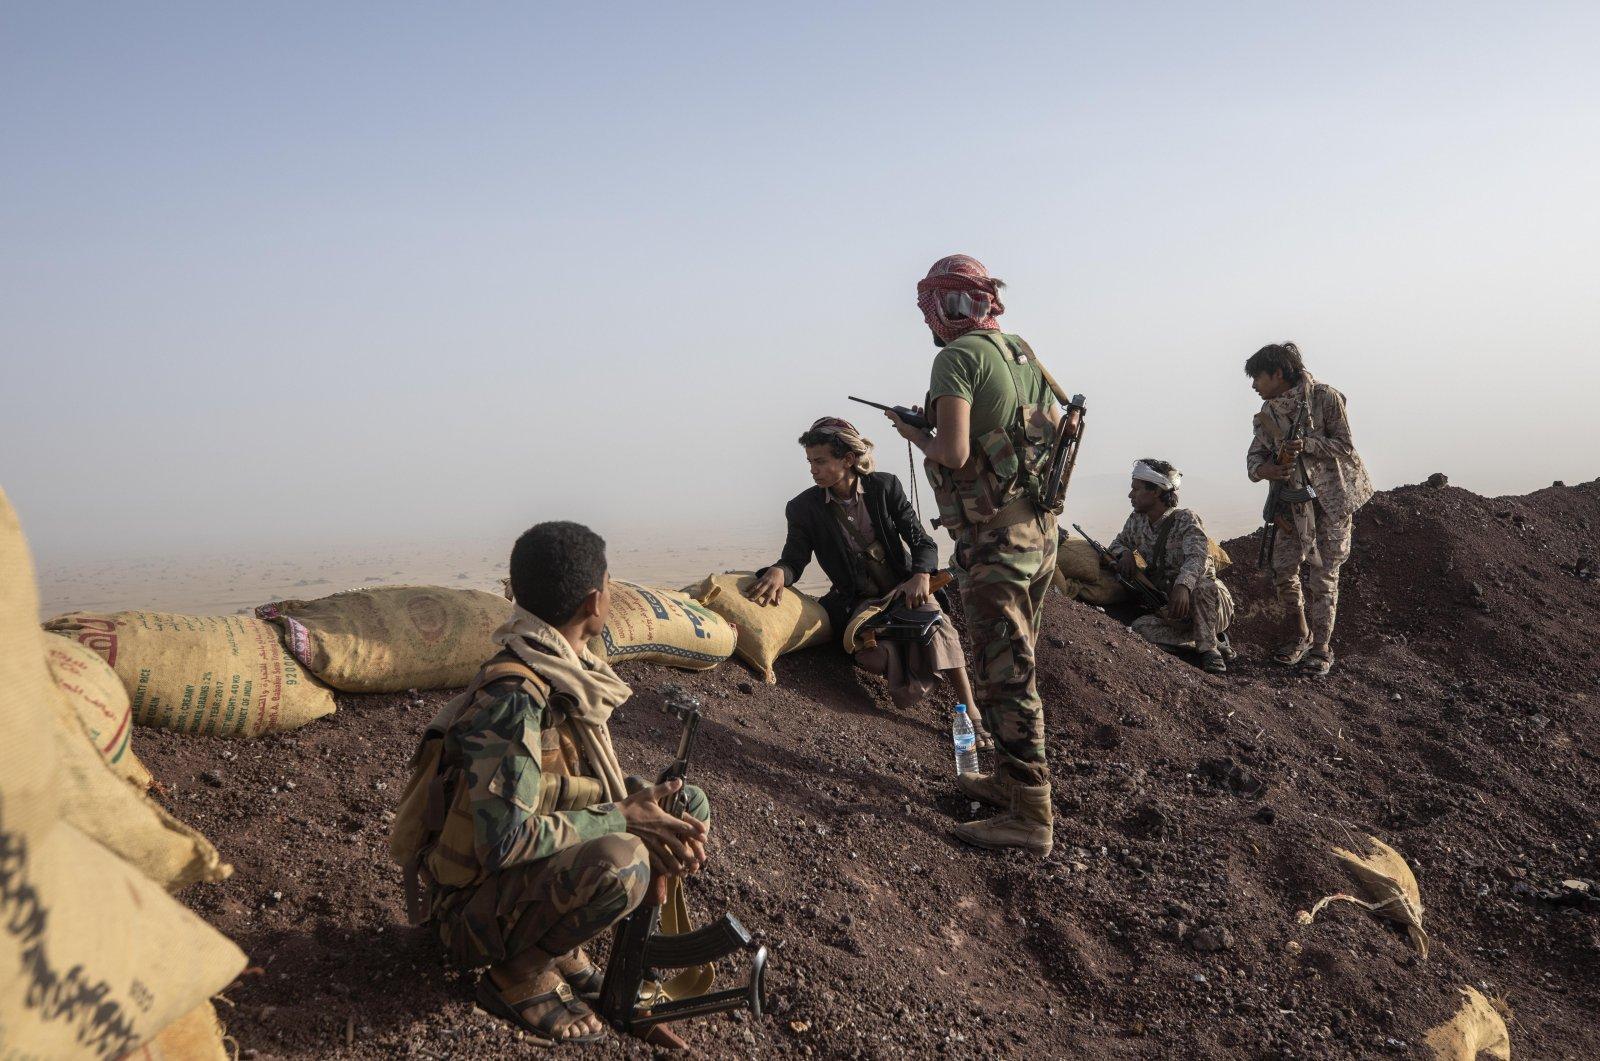 Yemeni fighters backed by the Saudi-led coalition on the Kassara frontline near Marib, Yemen, June 20, 2021. (AP Photo)